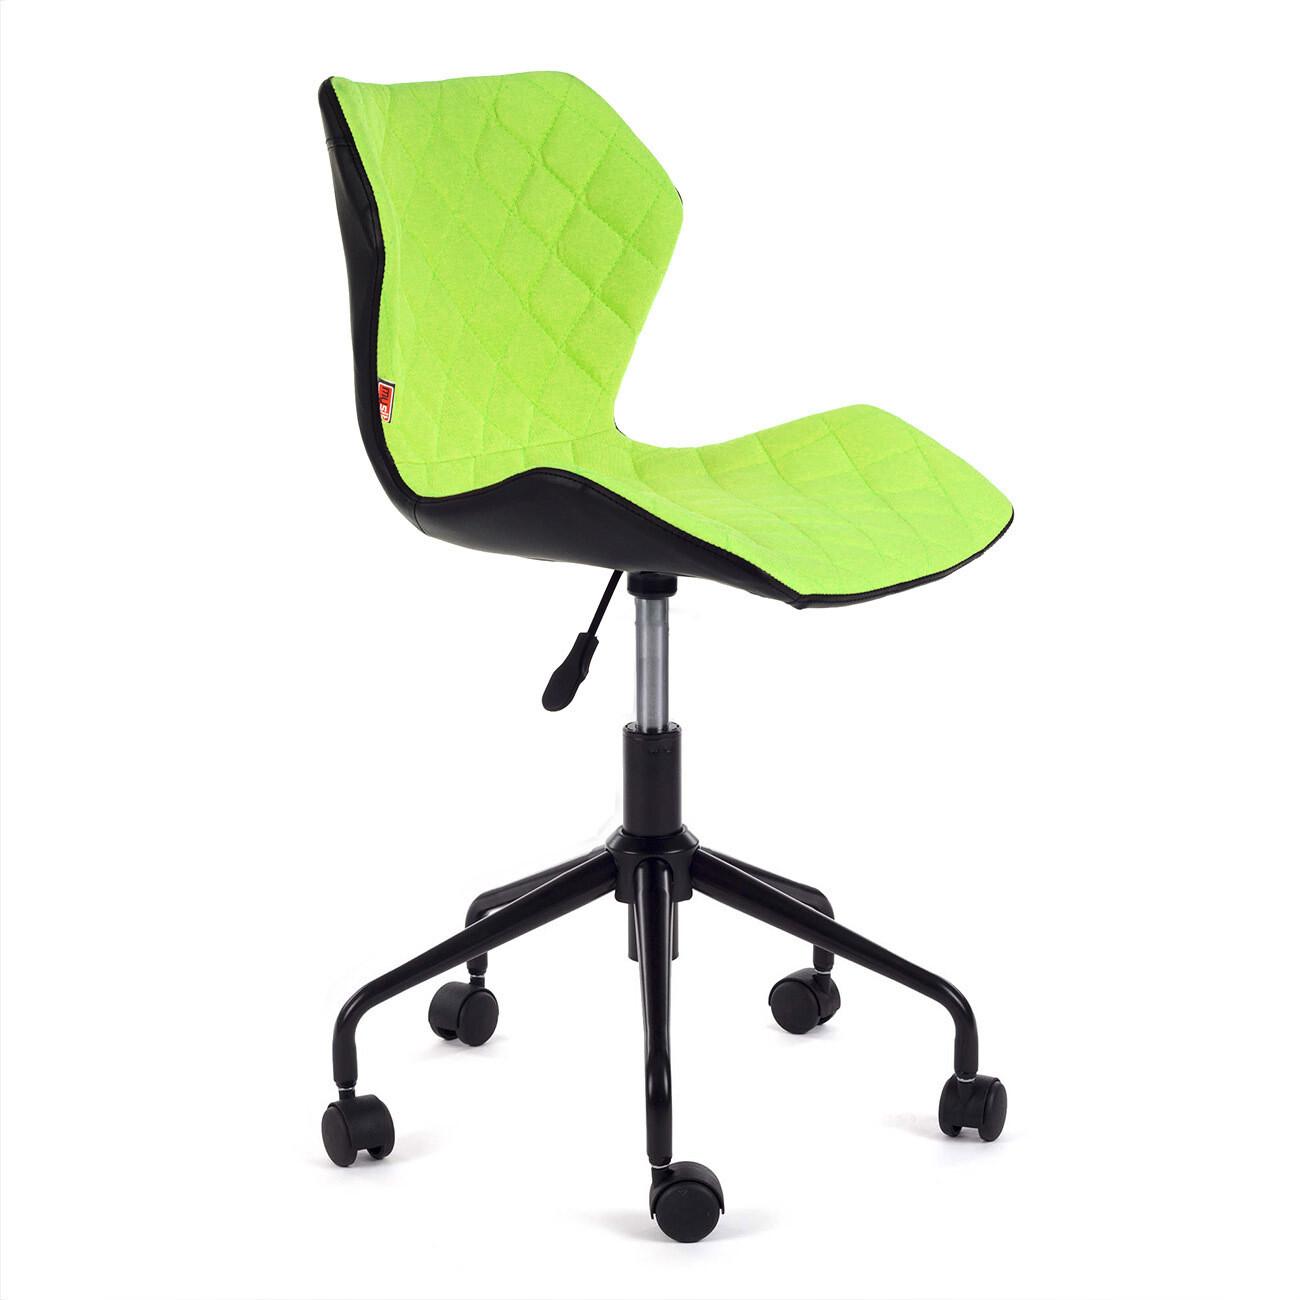 MY SIT Bürostuhl Design-Hocker Drehstuhl Stuhl INO Grün/Schwarz